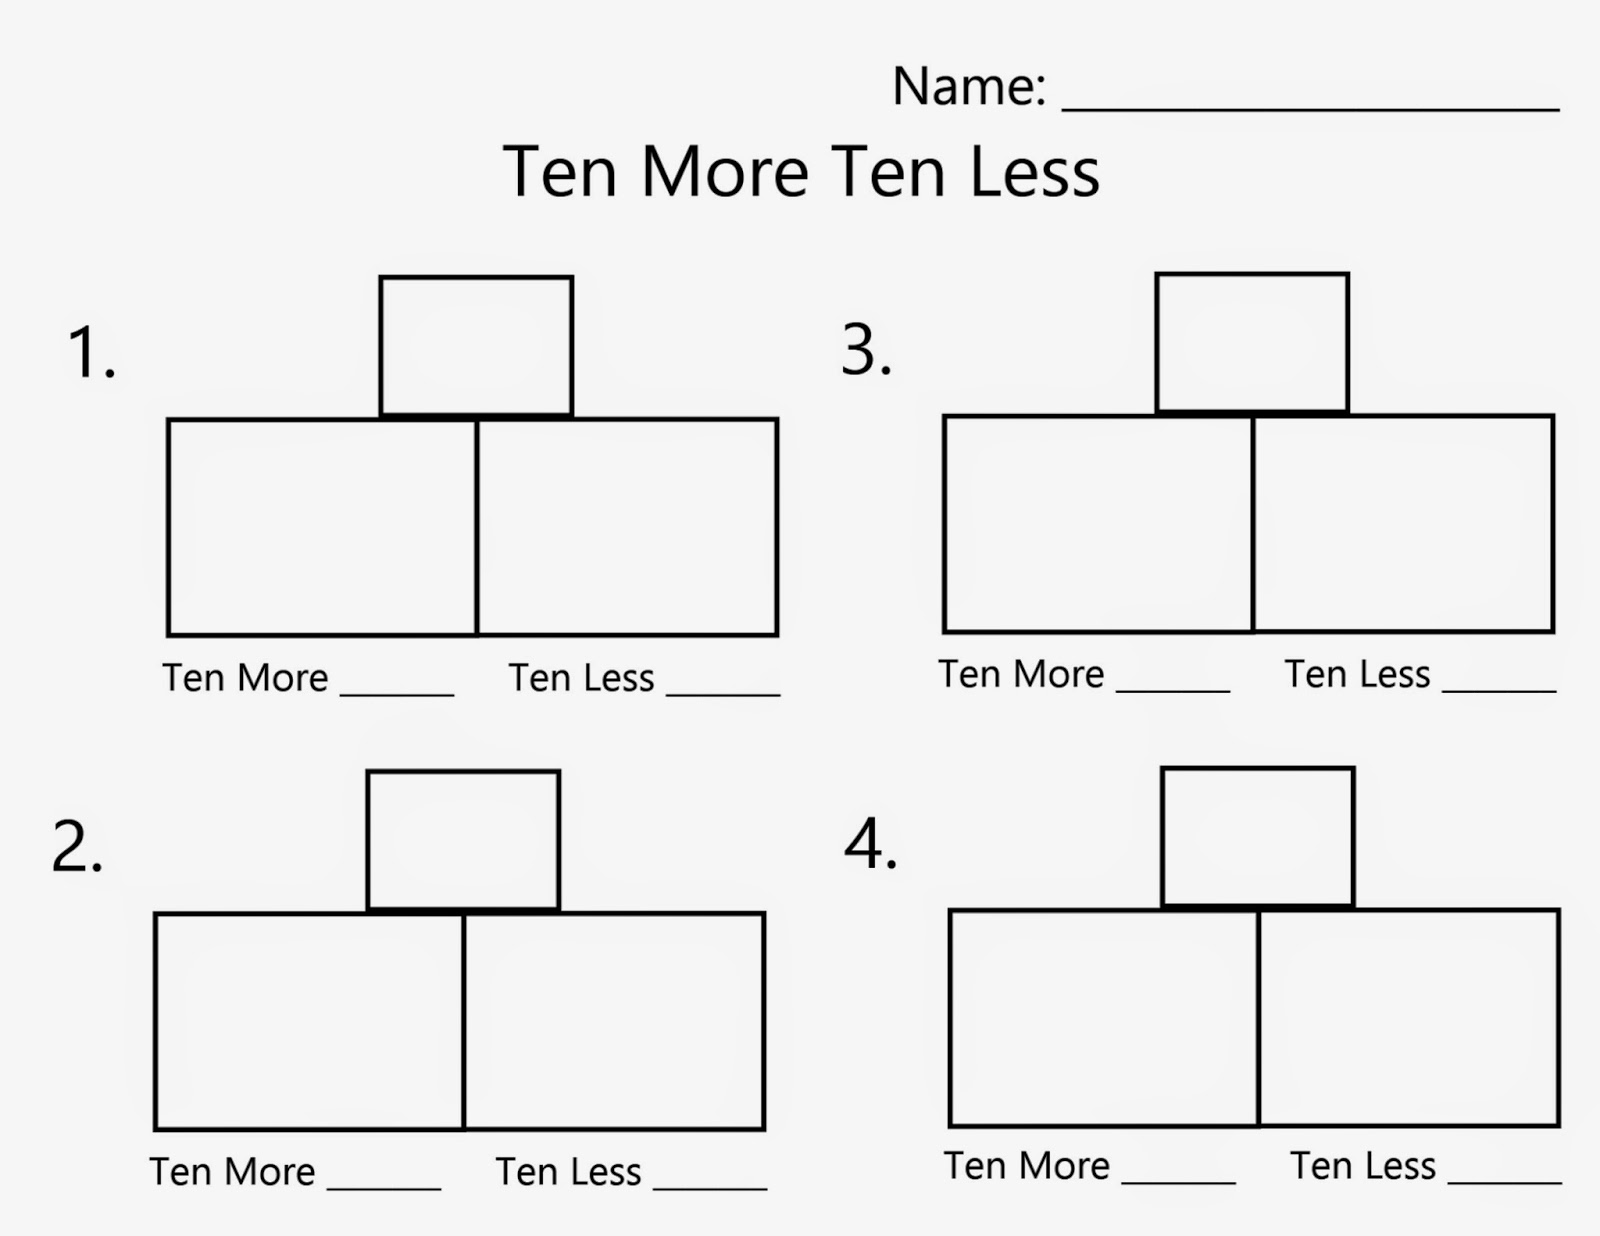 Ten More Ten Less Worksheet